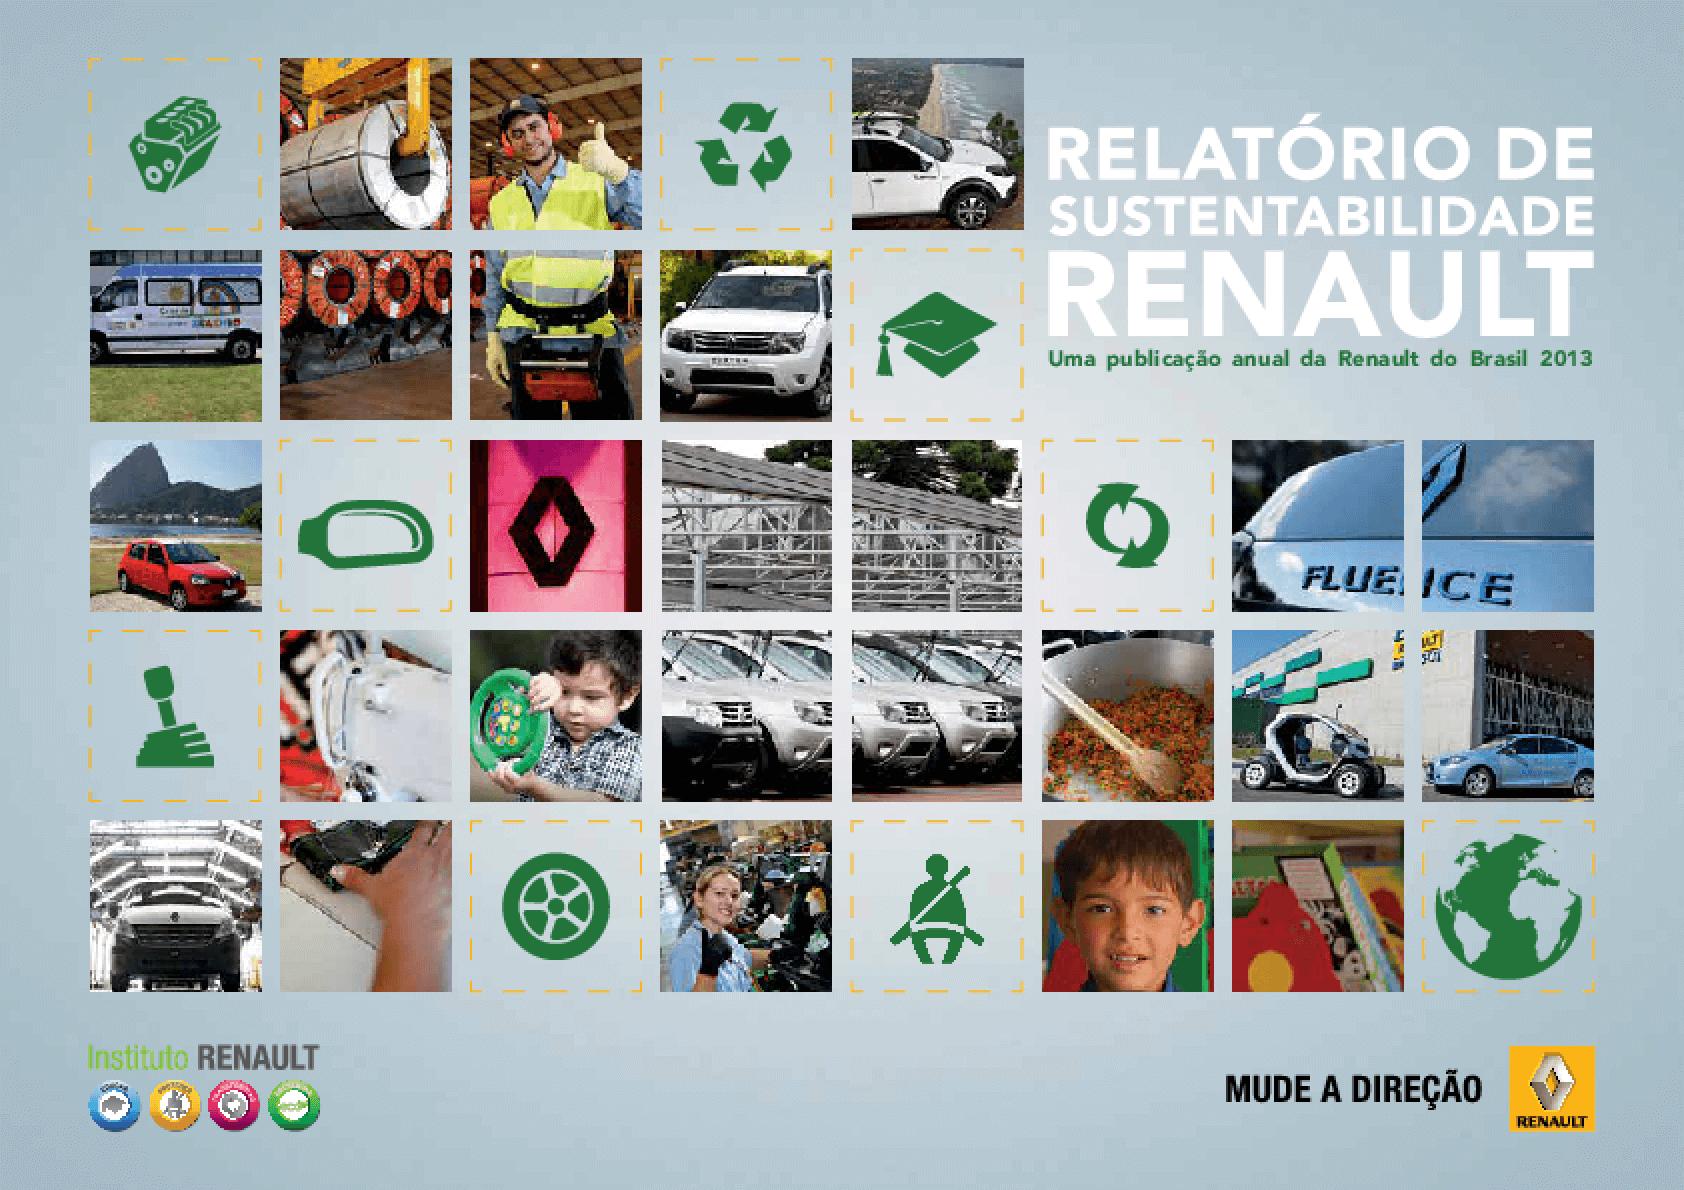 Relatório de sustentabilidade 2013 - Instituto Renault